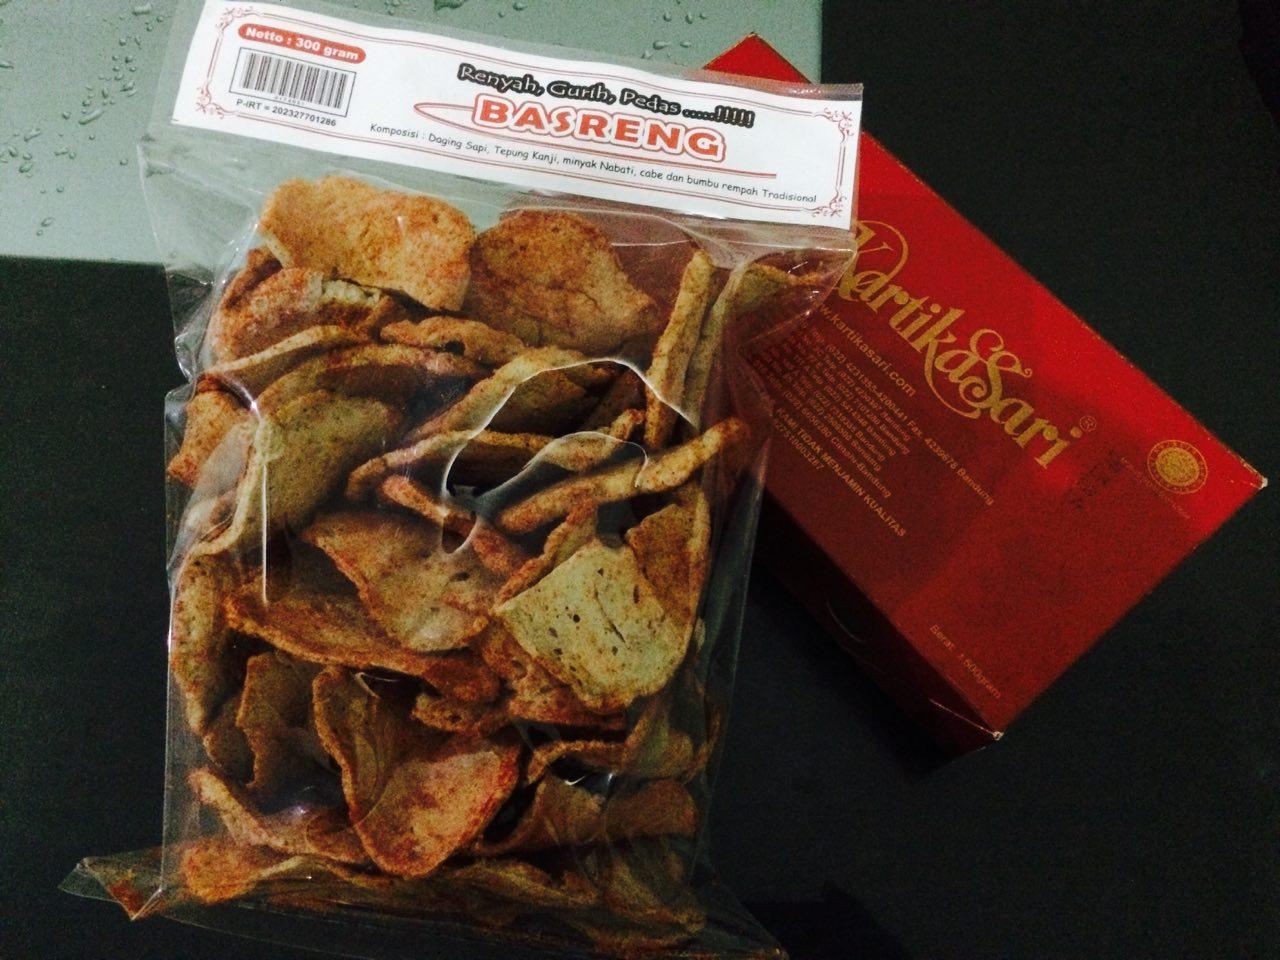 BASRENG, Bakso Goreng, Kuliner Bandung